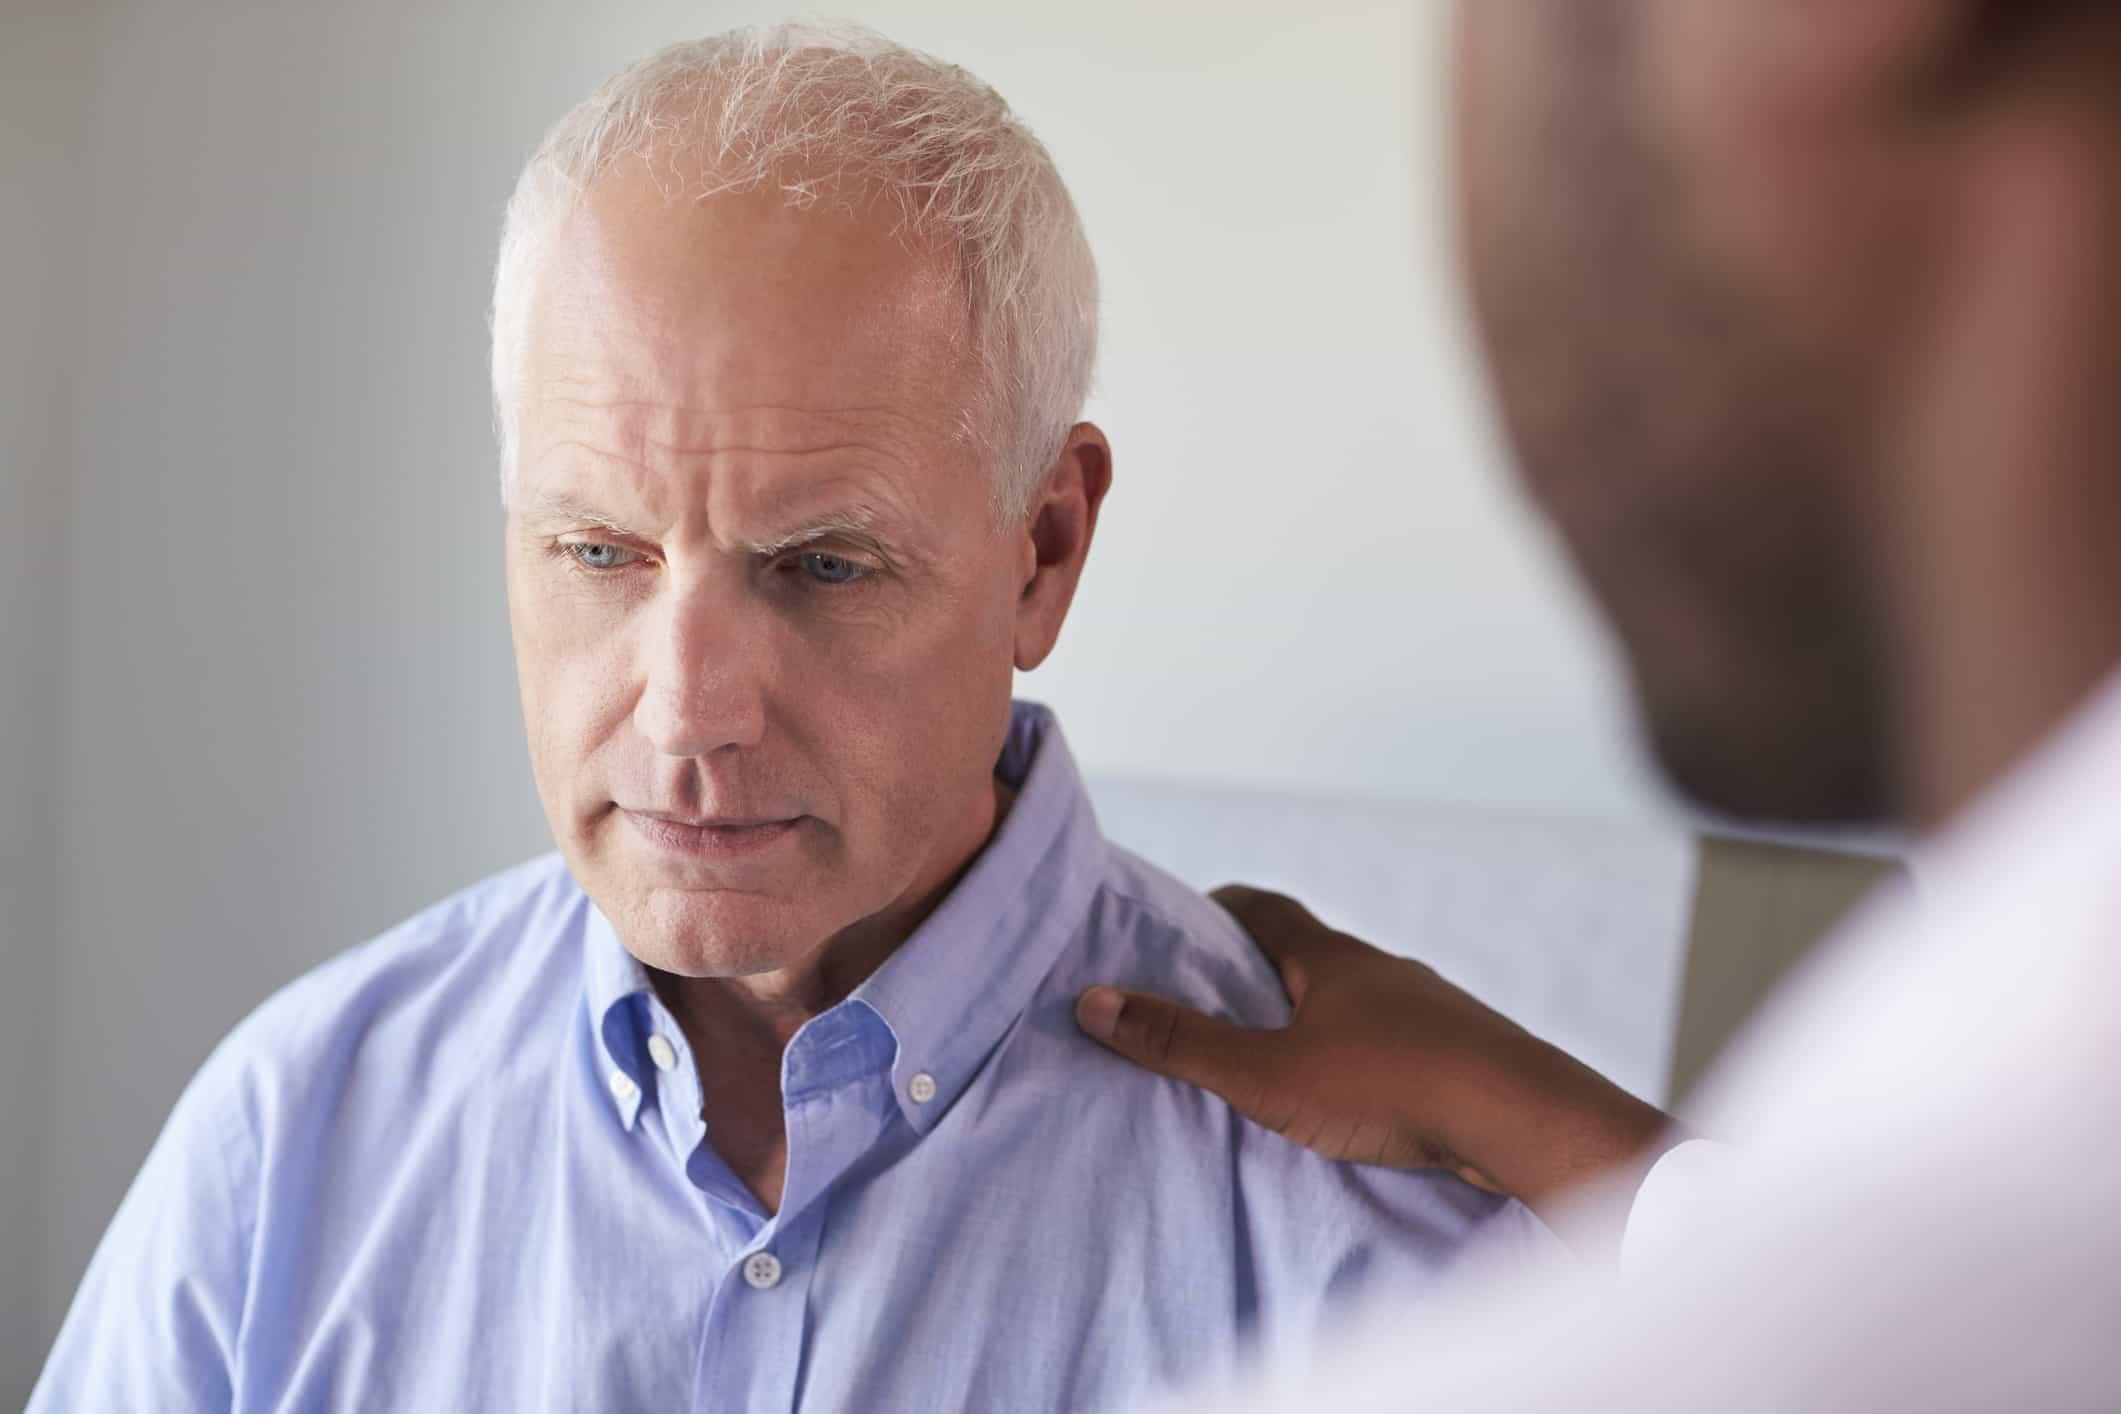 Man seeking outpatient addiction treatment